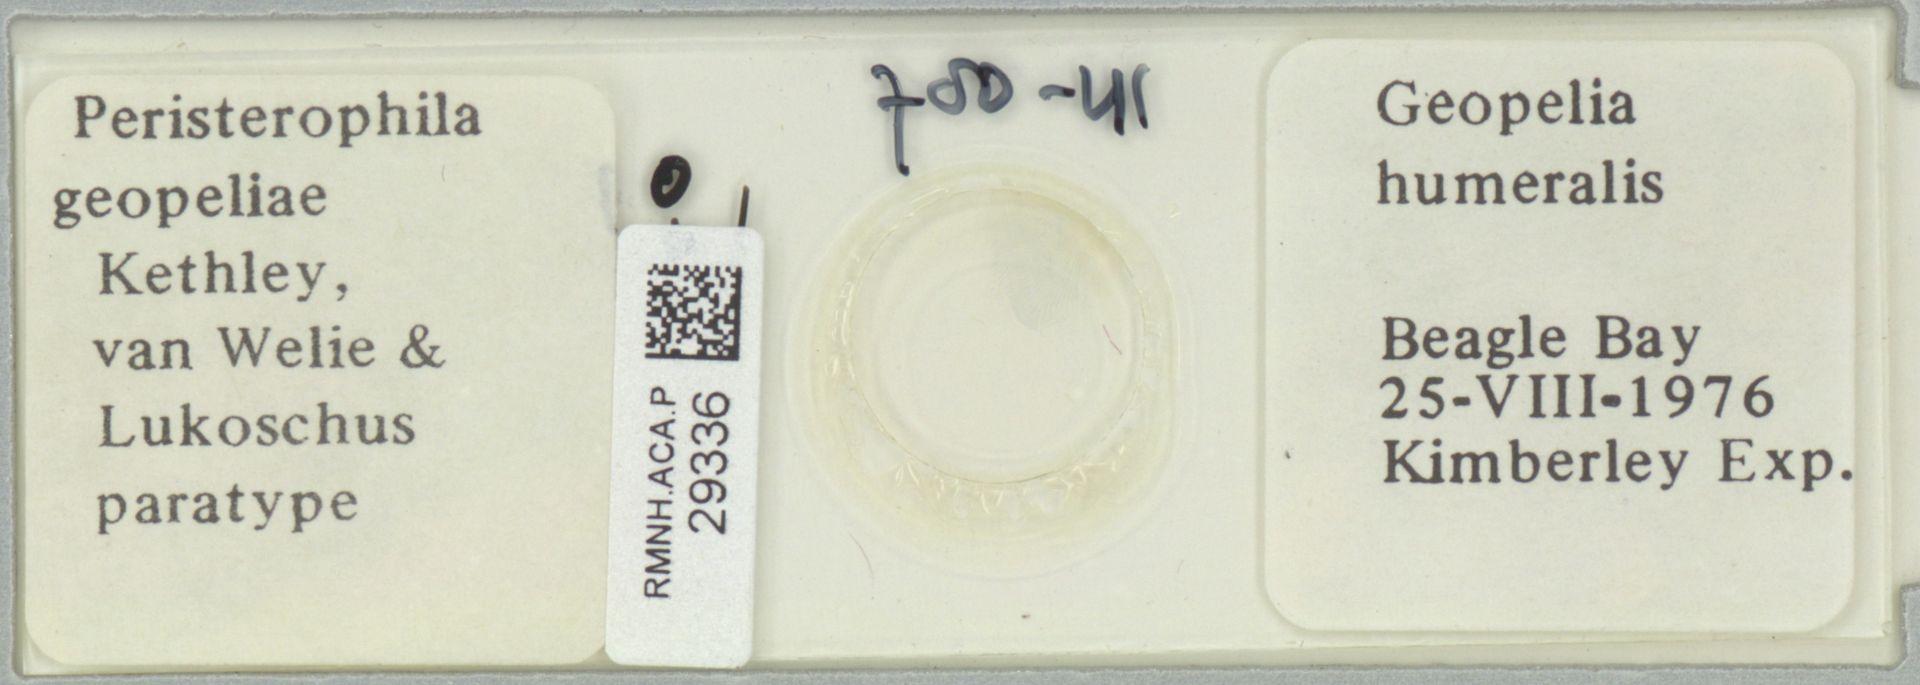 RMNH.ACA.P.29336 | Peristerophila geopeliae Kethley, van Welie & Lukoschus